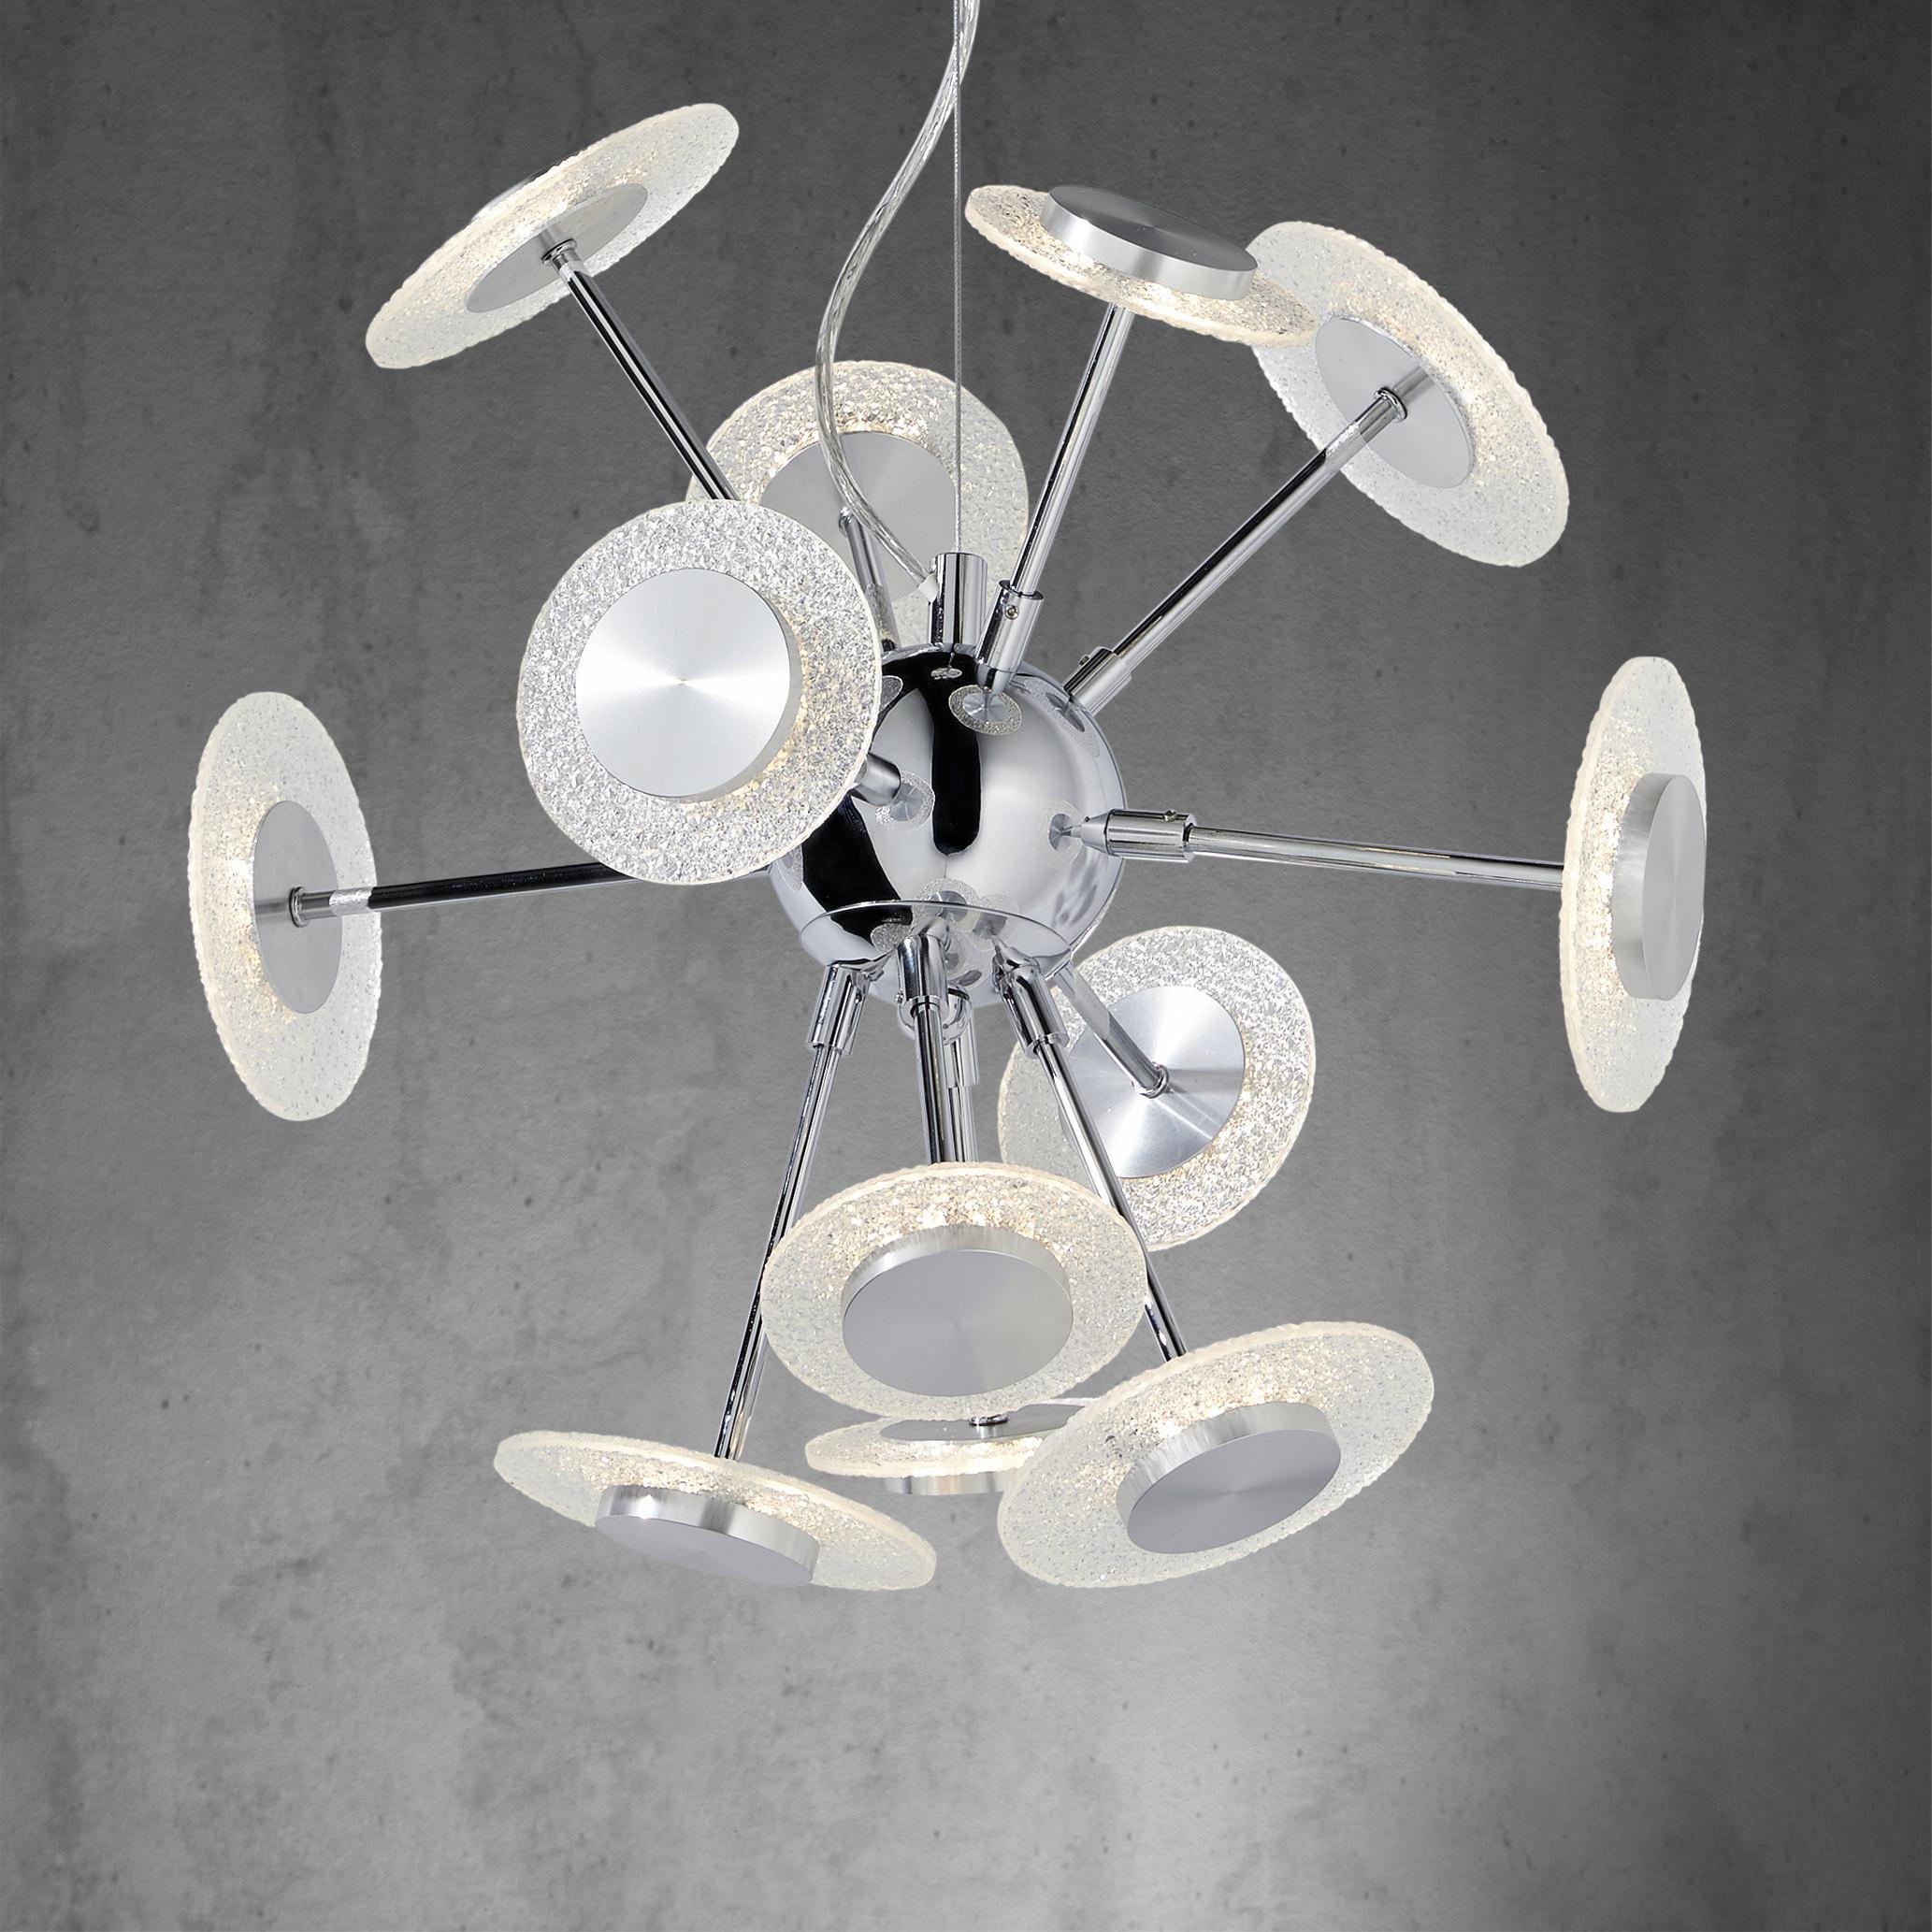 LED-Hängeleuchte Parici - Chromfarben, MODERN, Kunststoff/Metall (43/43/133cm) - MÖMAX modern living